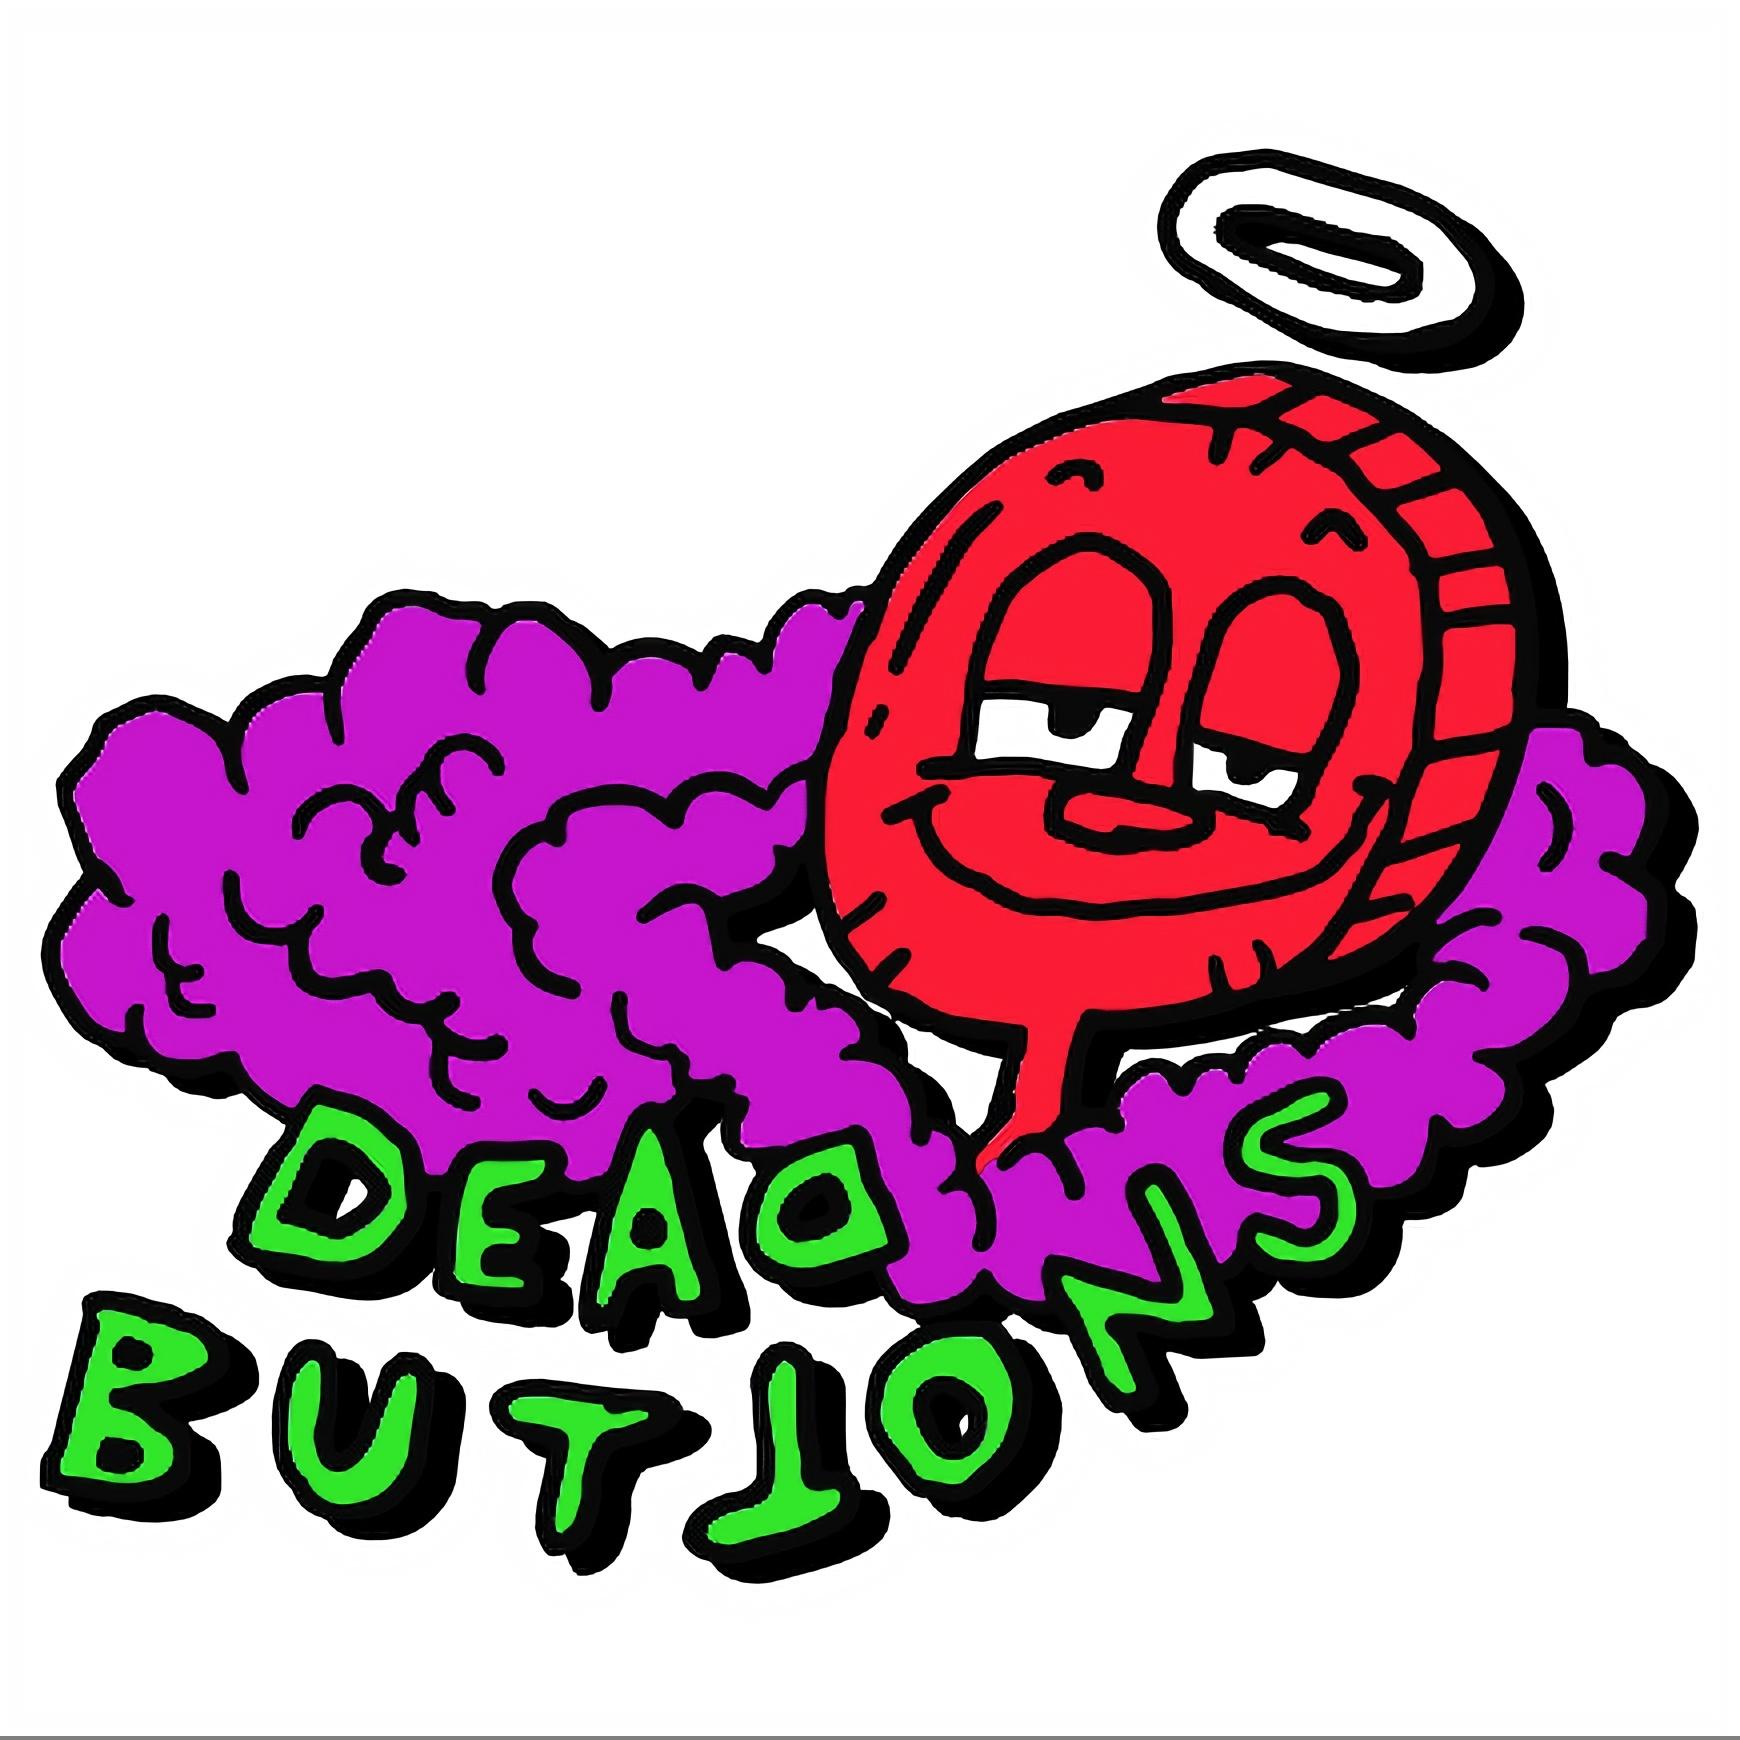 Dead Buttons